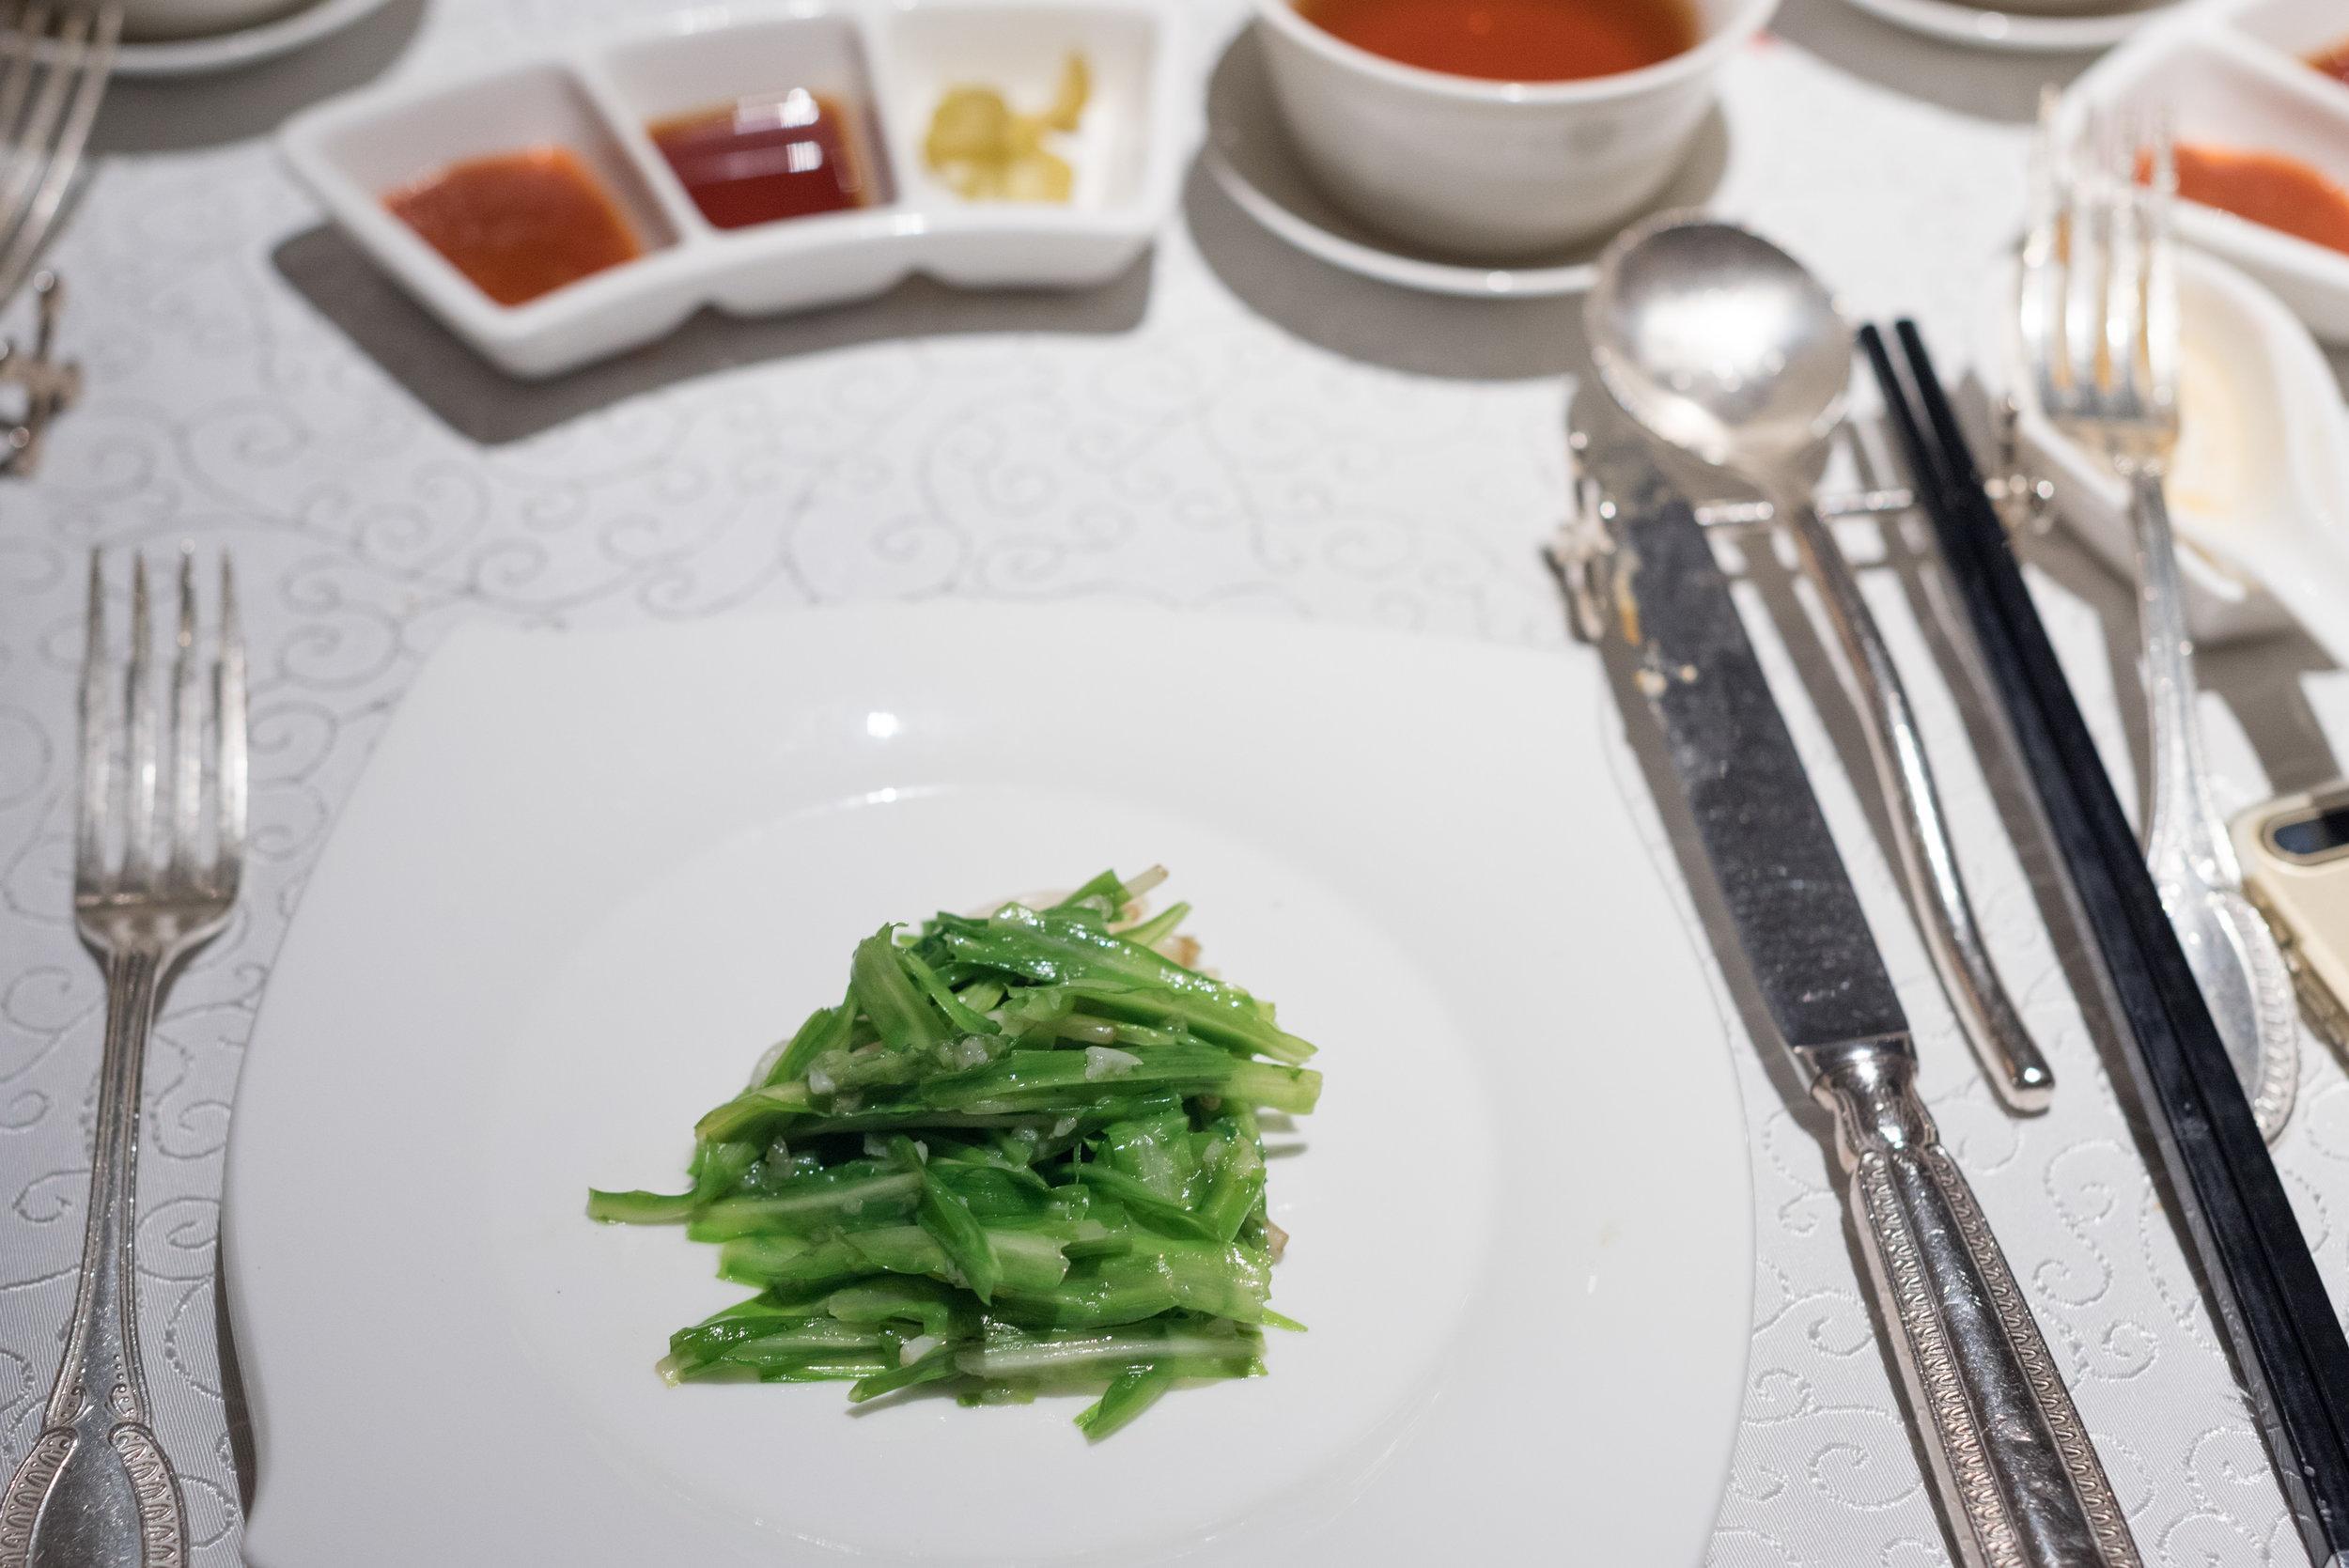 Wok-fried Green Dragon Vegetable with Garlic  Yan Ting - The St. Regis Singapore